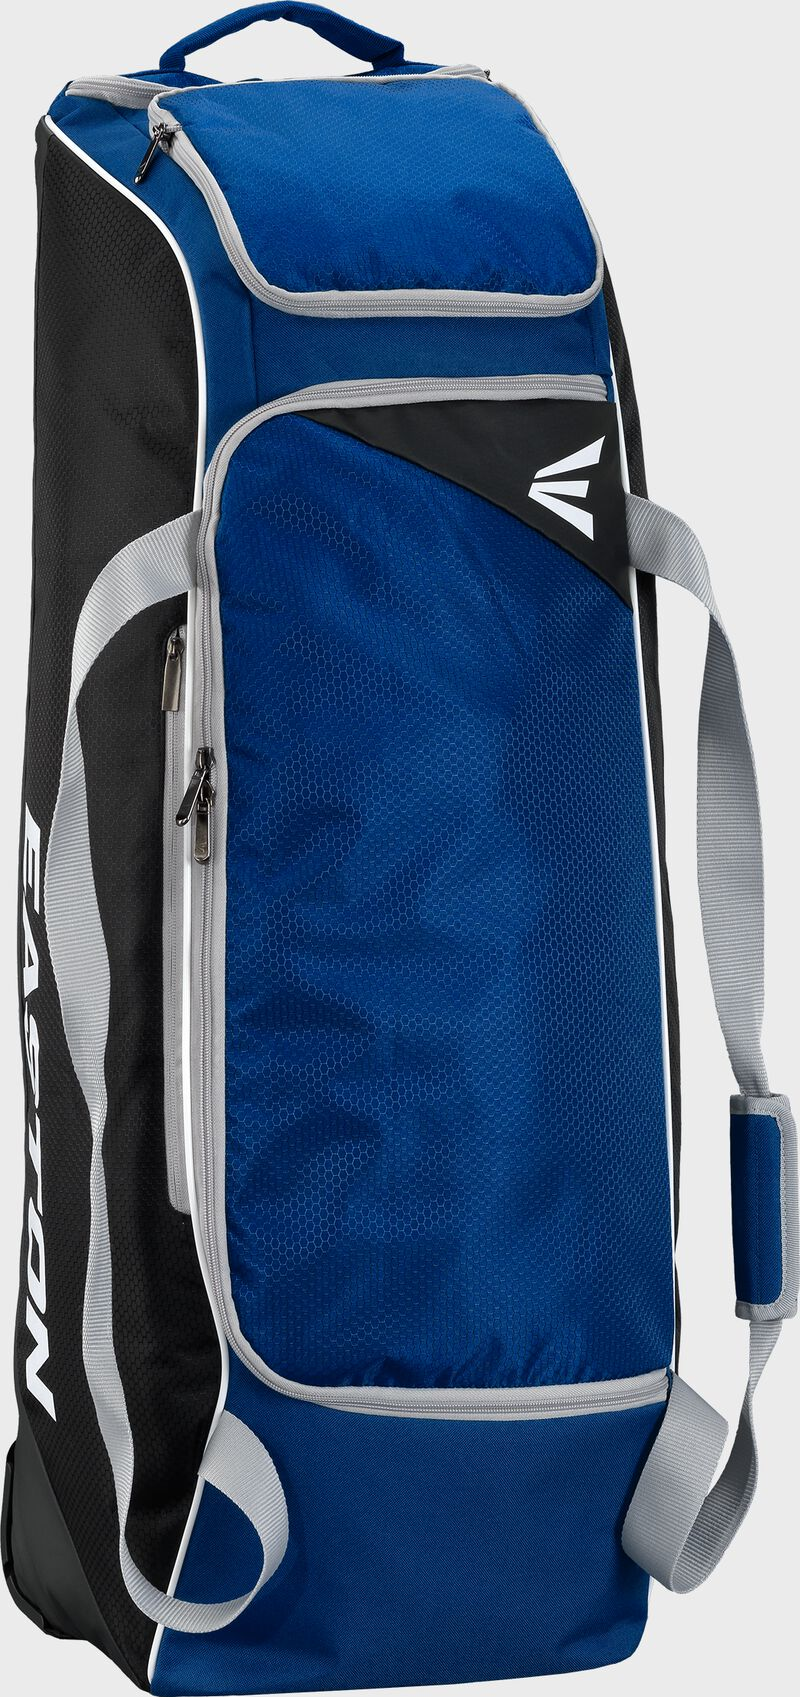 Octane Wheeled Bag   NY